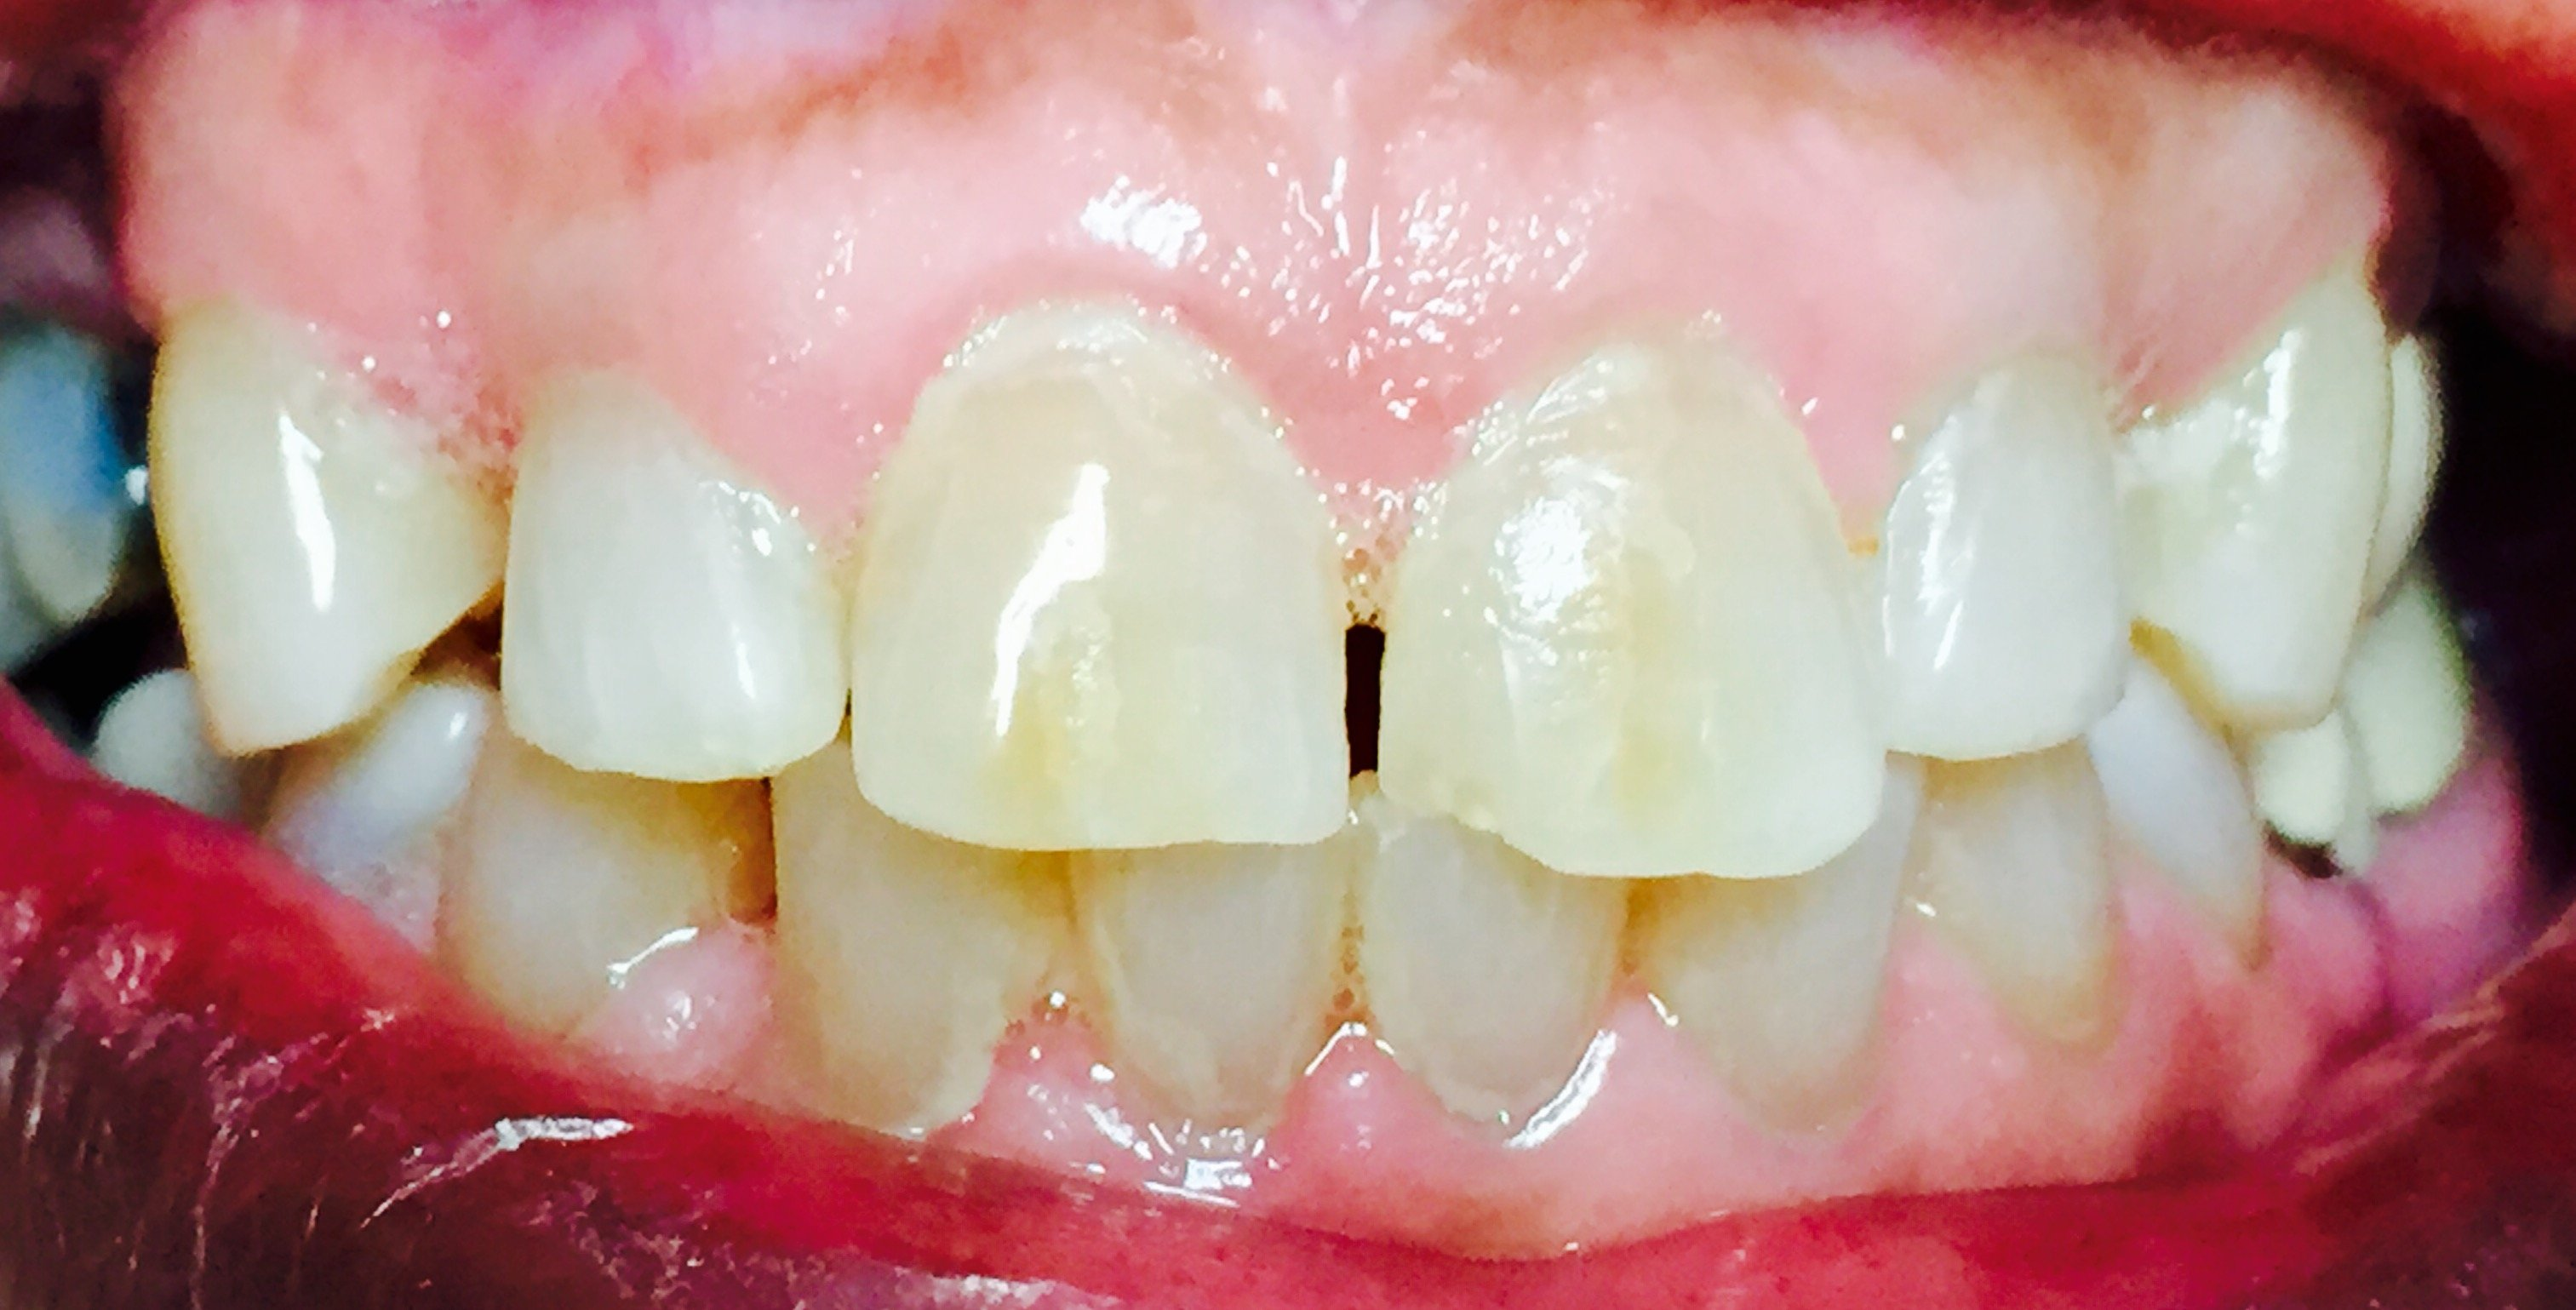 Before fixing teeth